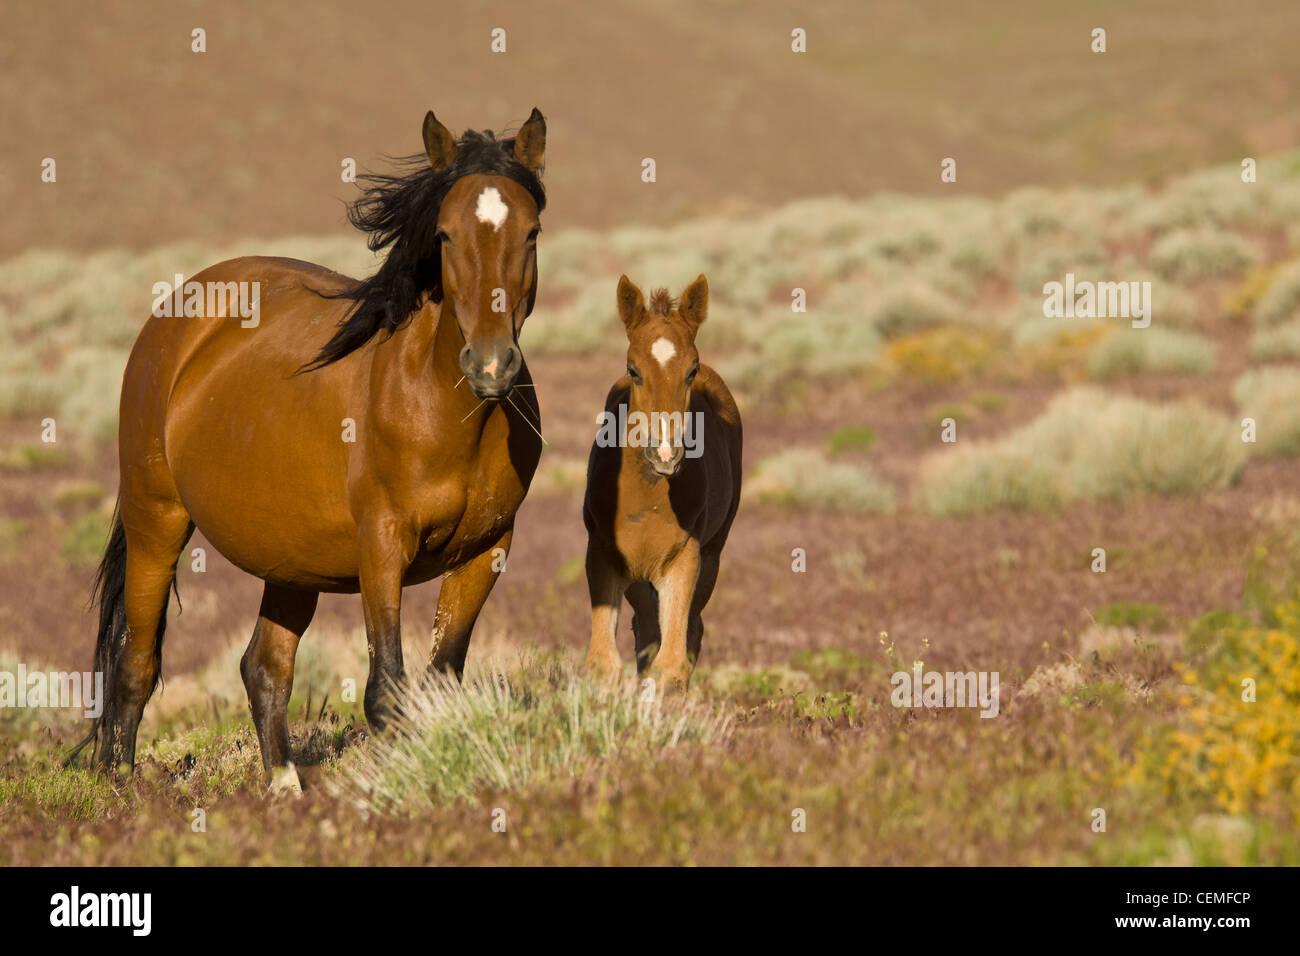 Wild Horse Mare With Colt Baby Equus Ferus Nevada Stock Photo Alamy